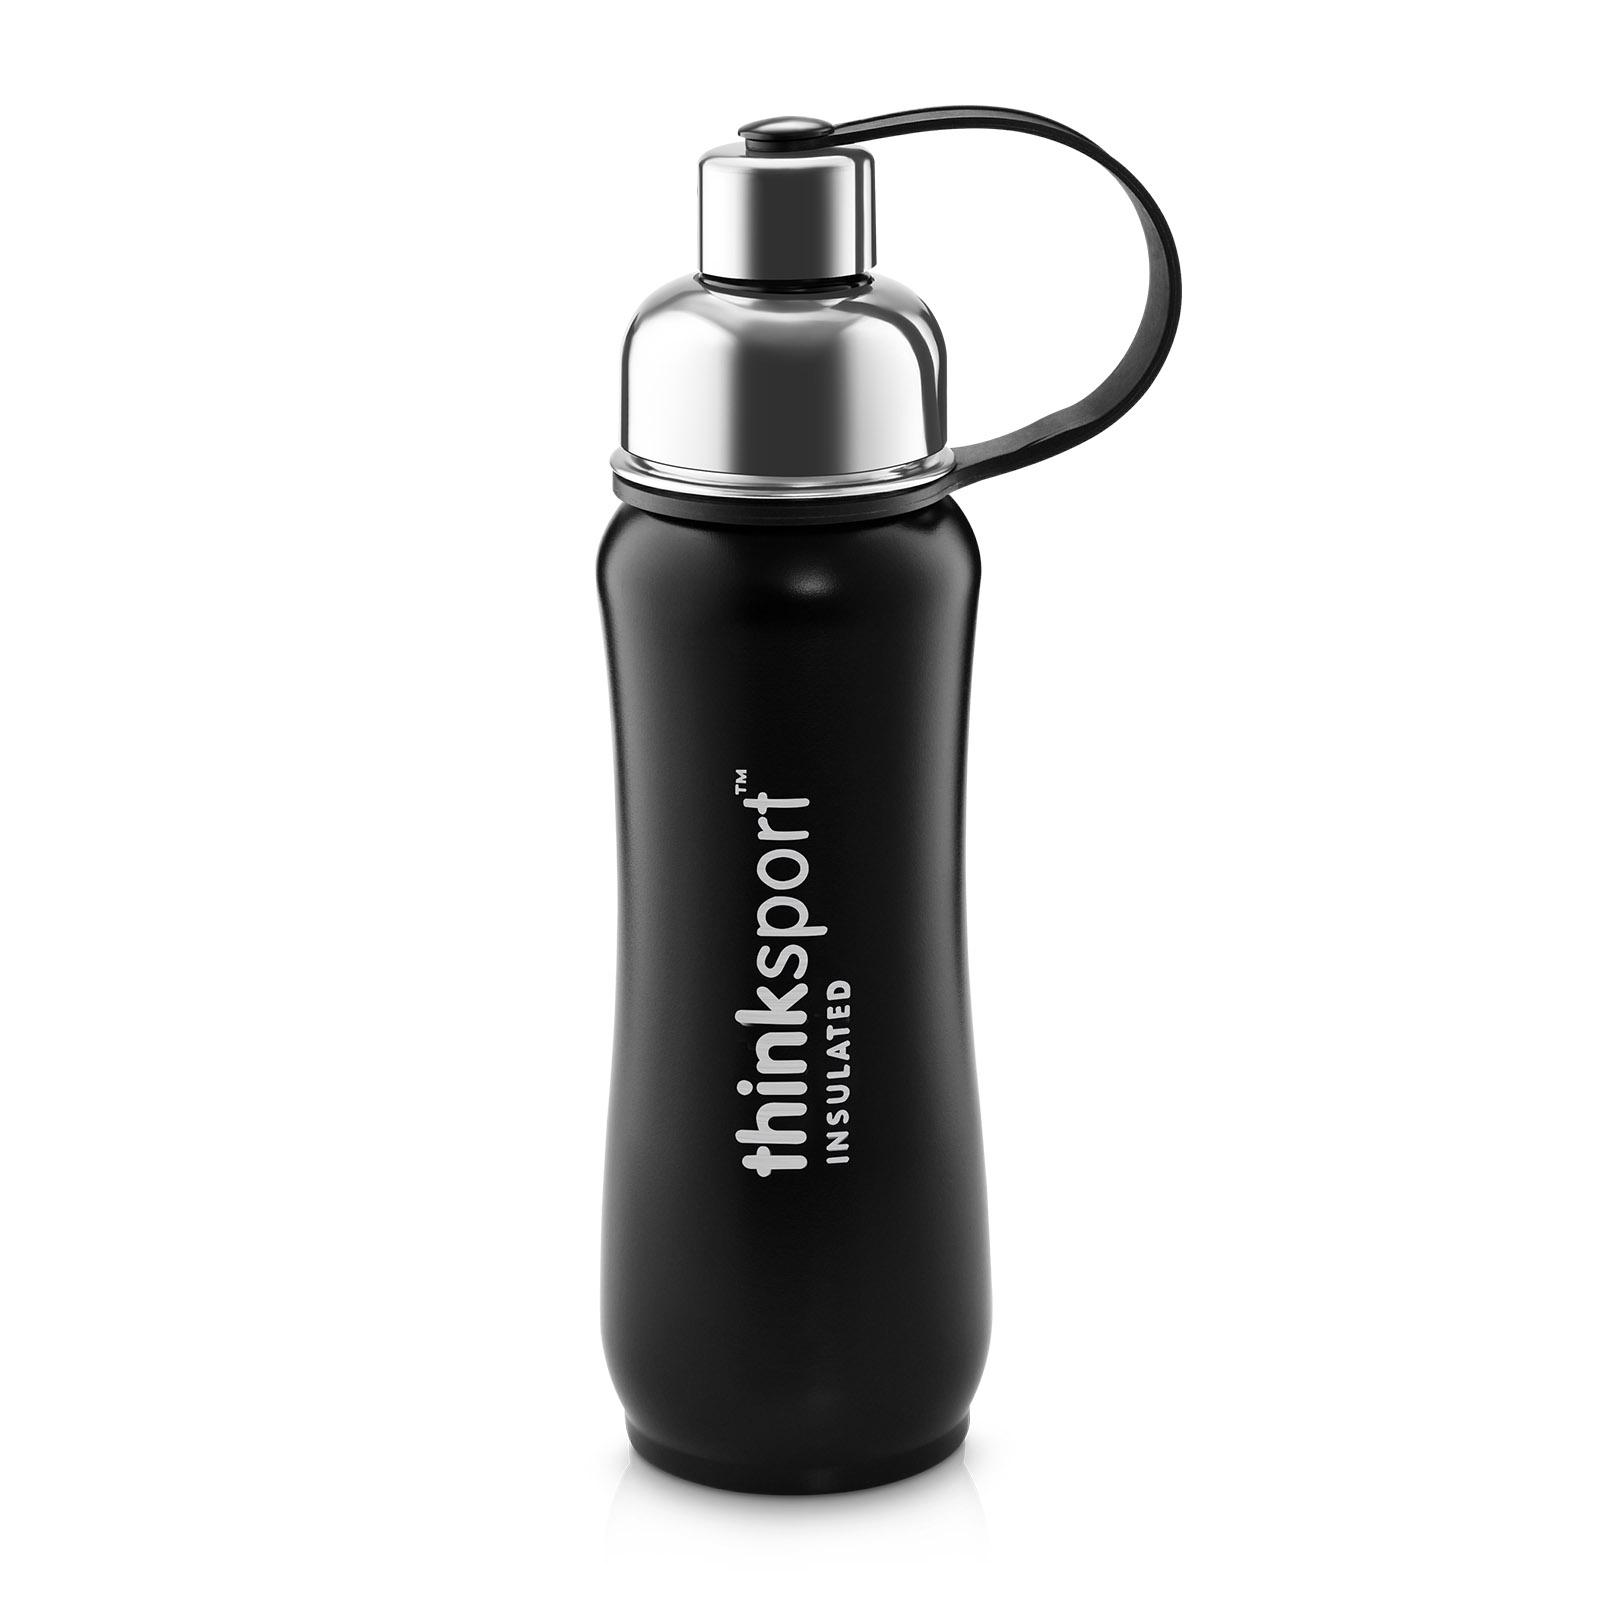 Thinksport 500Ml Insulated Sports Bottle Green 17 oz